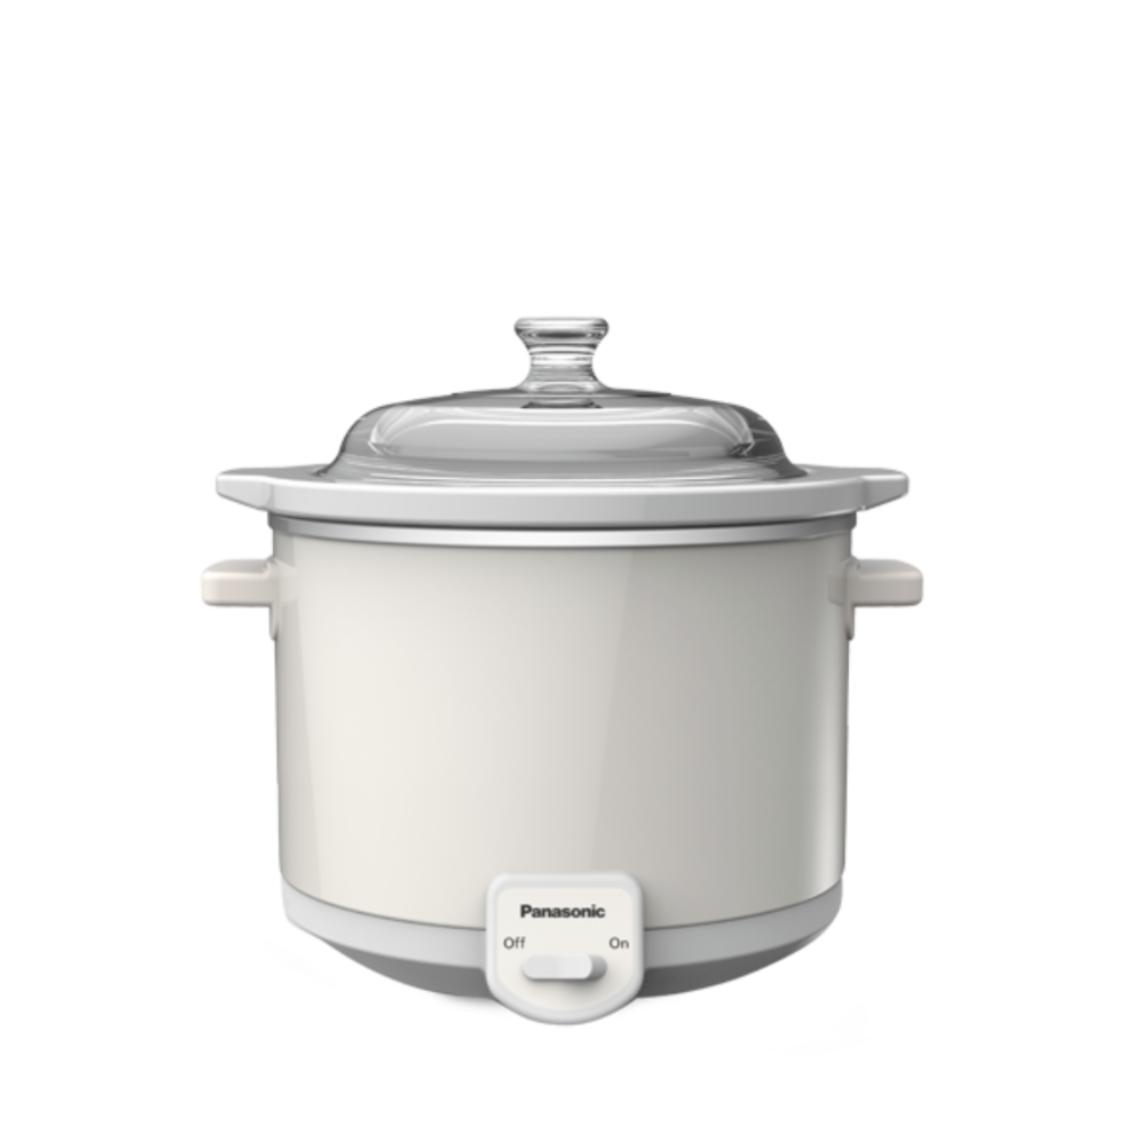 Panasonic Slow Cooker 15L